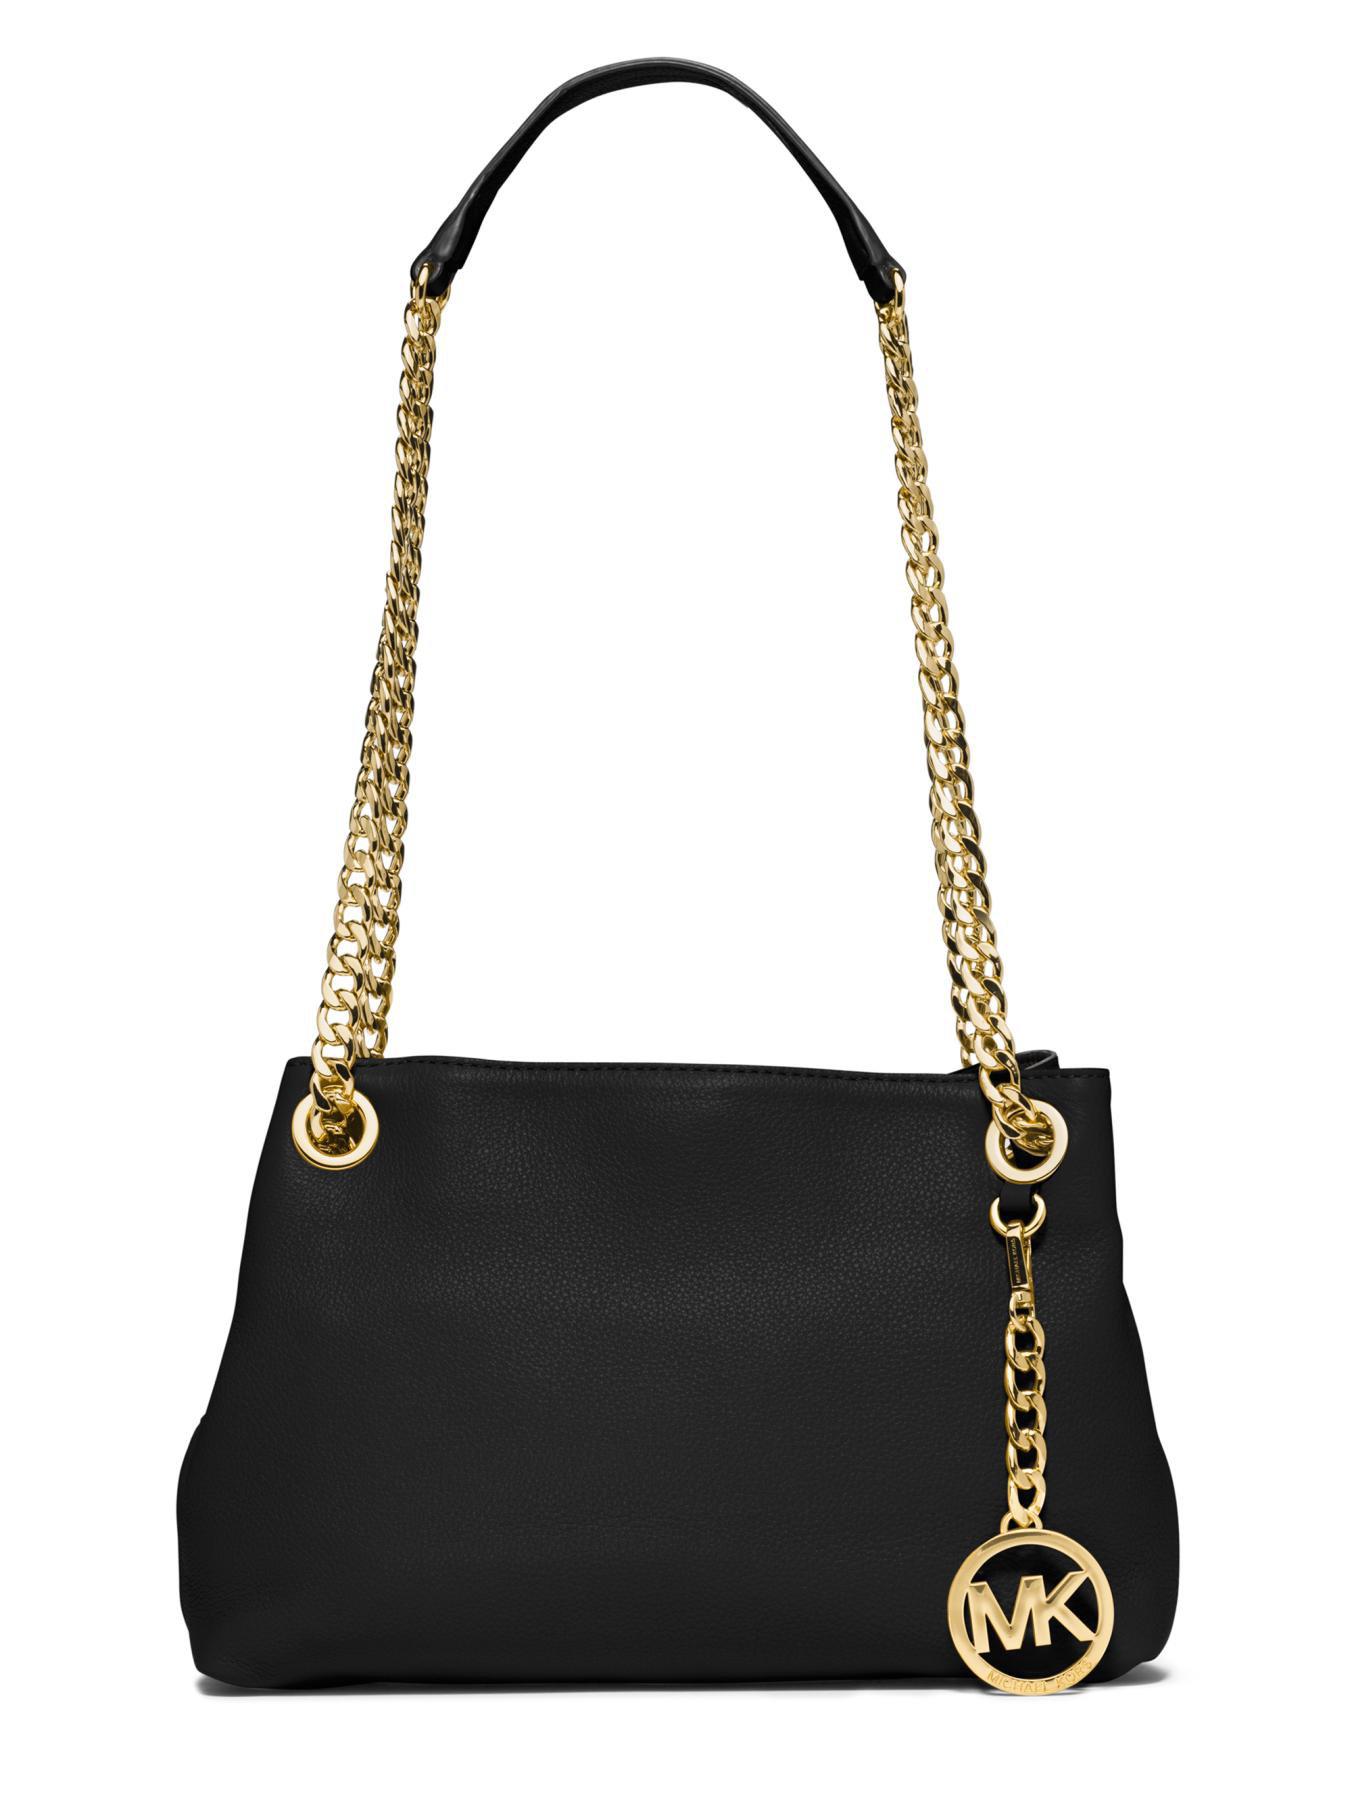 michael kors bag with gold chain